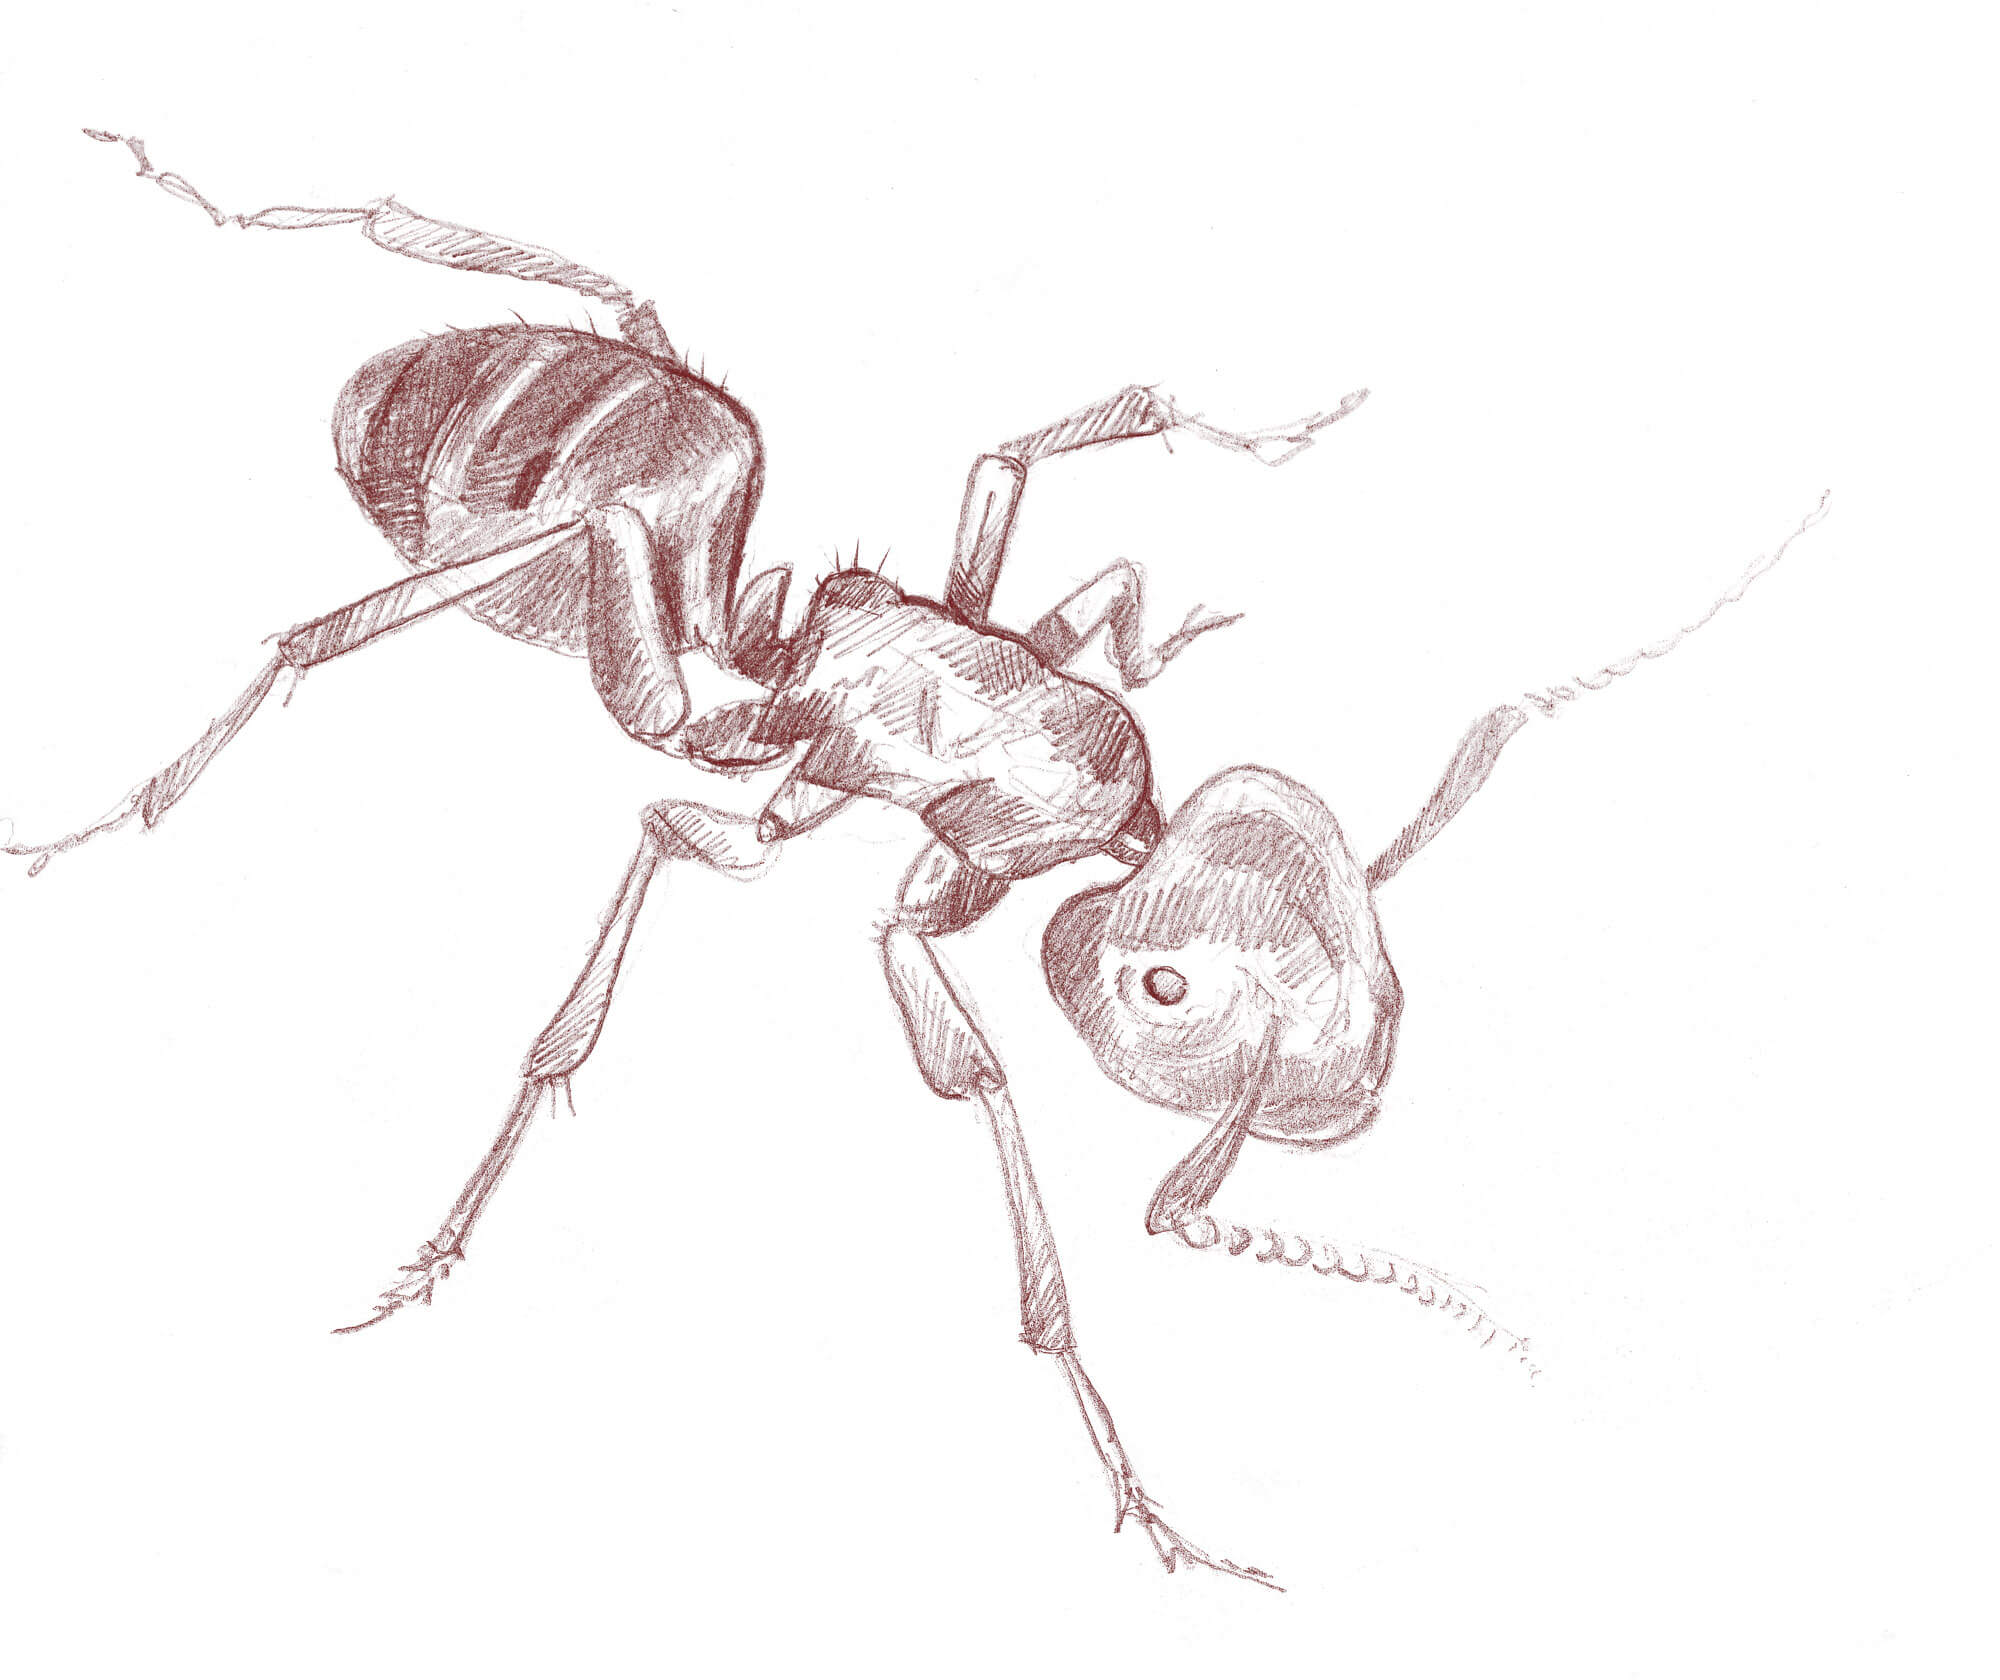 Dessin de fourmi Camponotus herculeanus